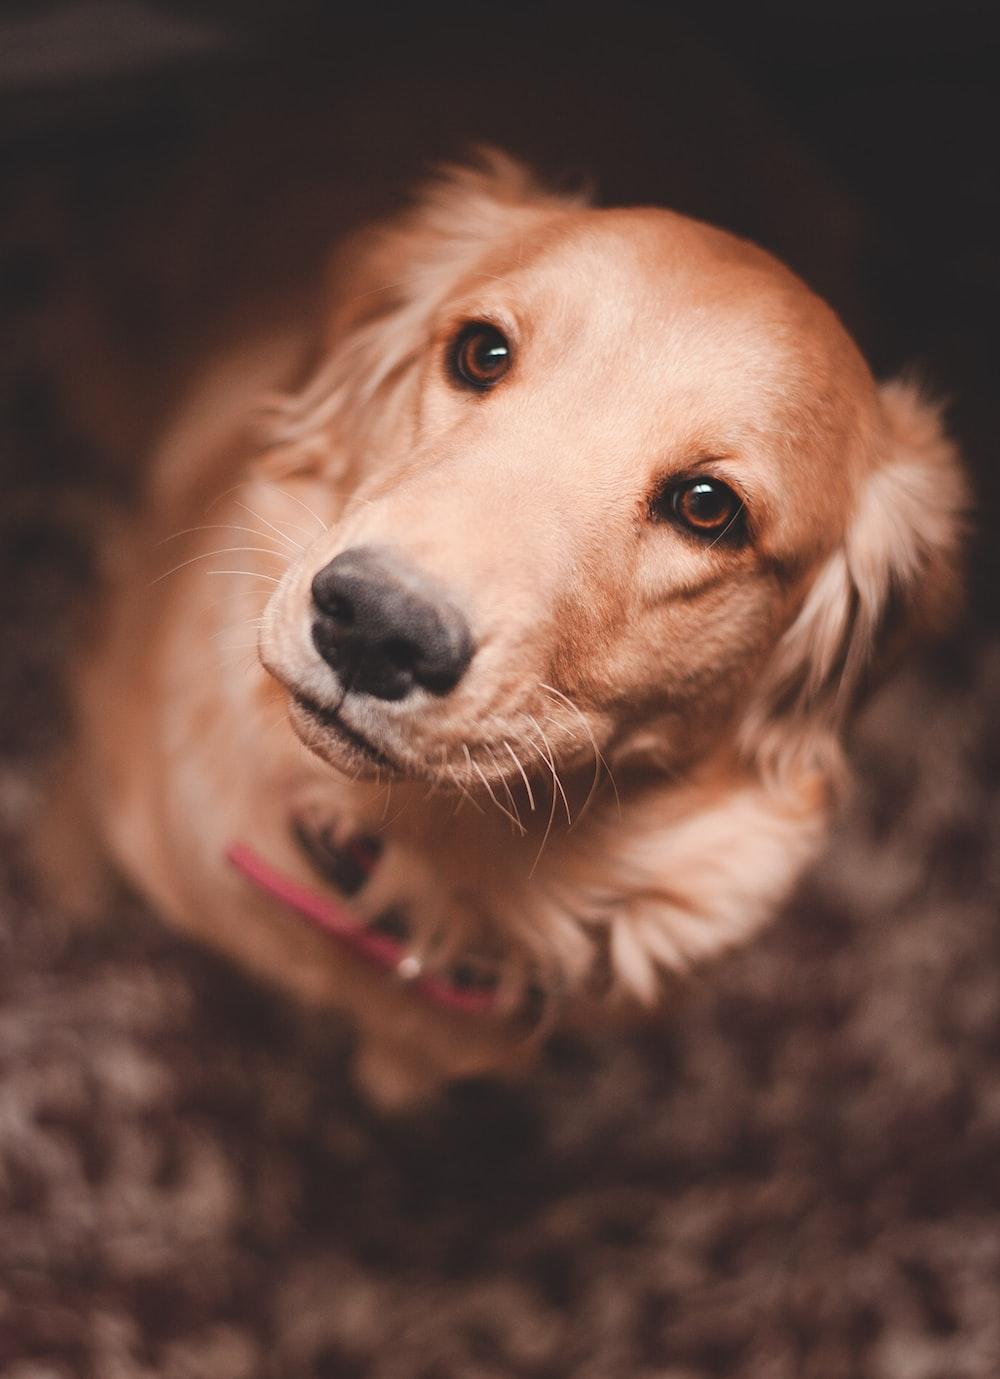 tilt-shift photography of dog